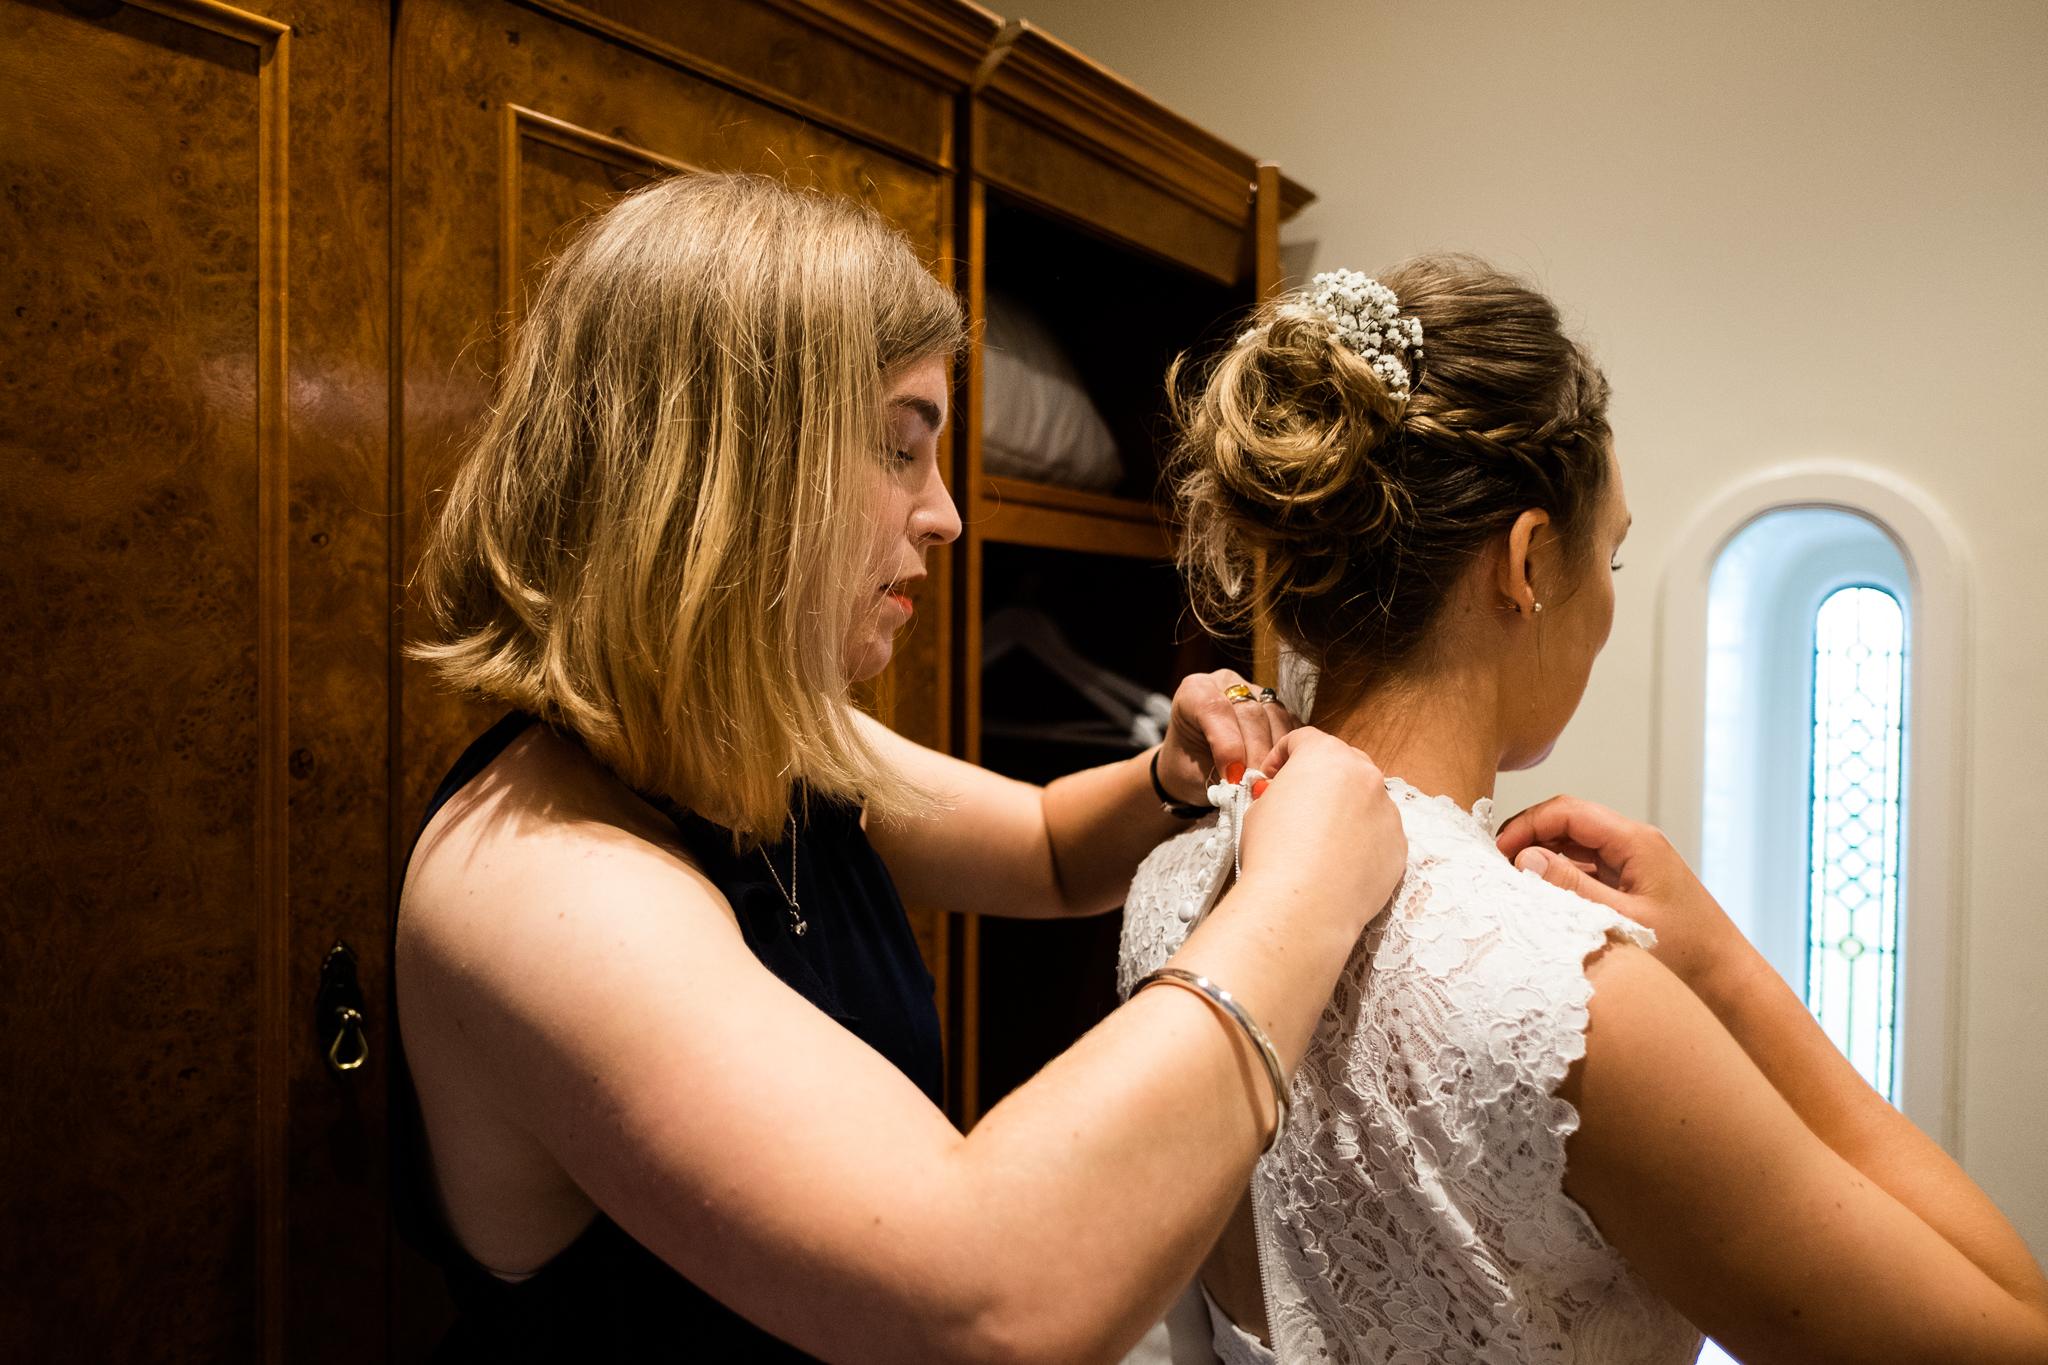 Relaxed Documentary Wedding Photography at The Wizard Inn, Alderley Edge Cheshire - Jenny Harper-9.jpg